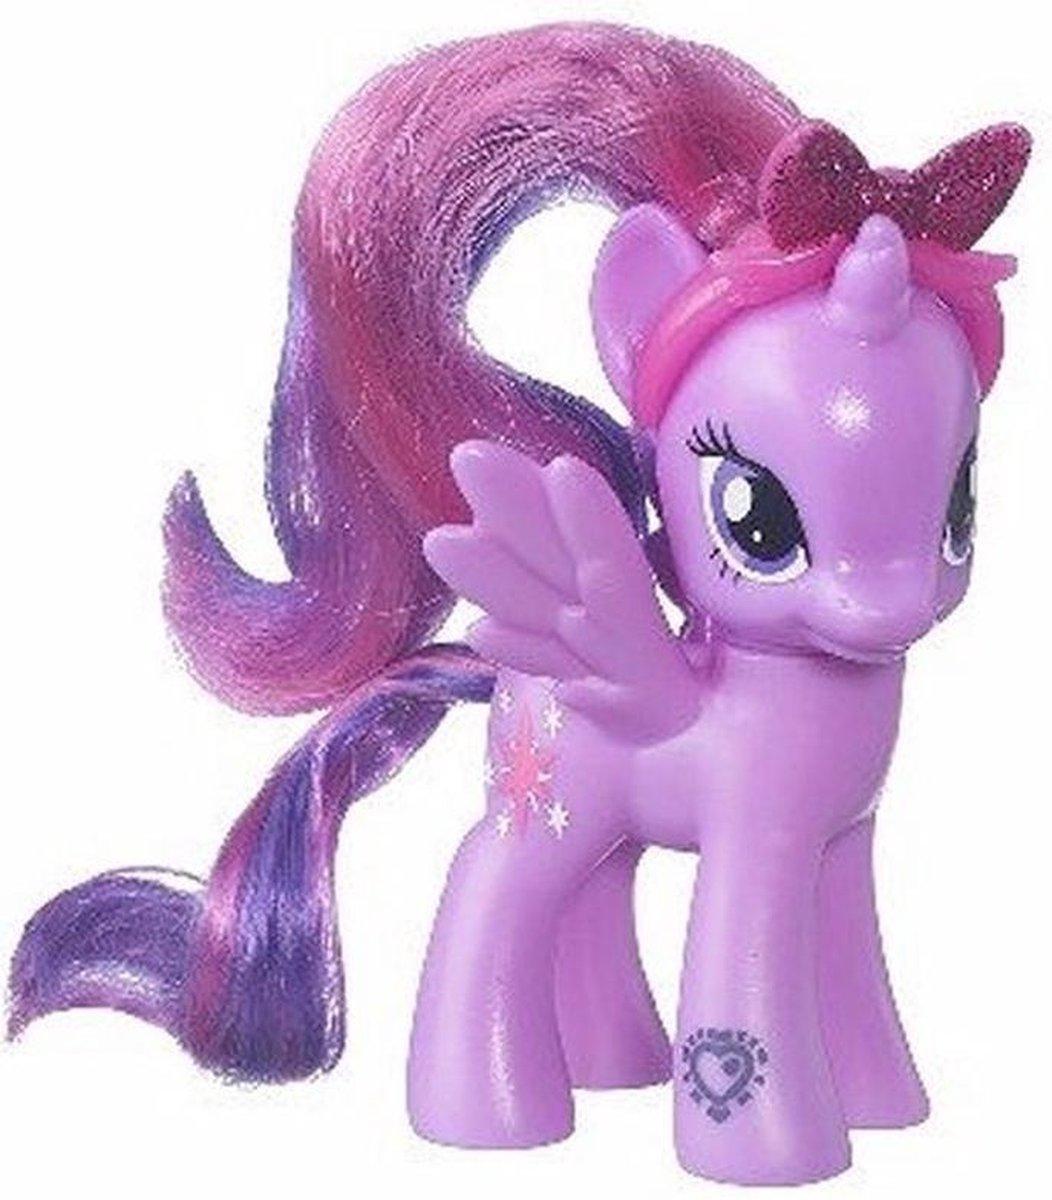 My Little Pony Twilight Sparkle speelfiguur 8 cm - My Little Pony